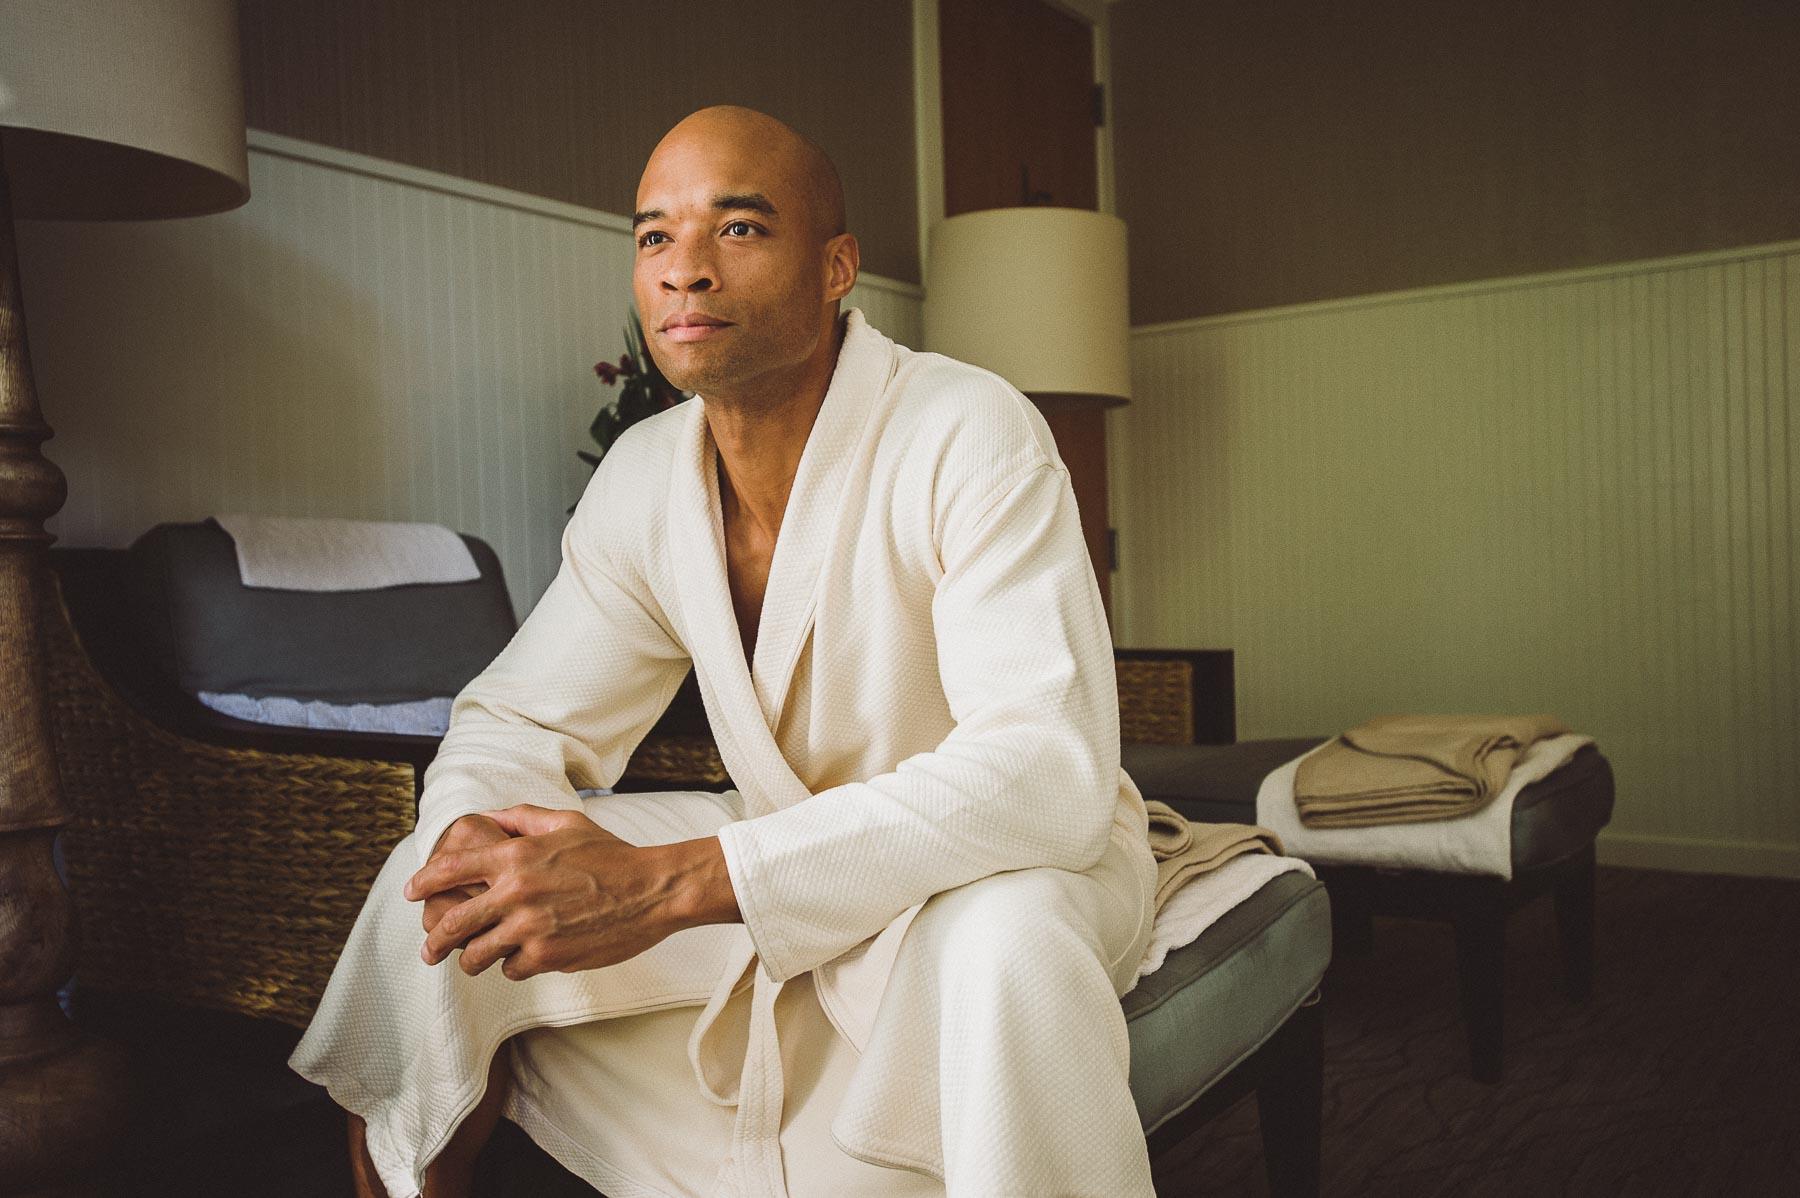 Man enjoys the private meditation room at Omni, Amelia Island Resort.